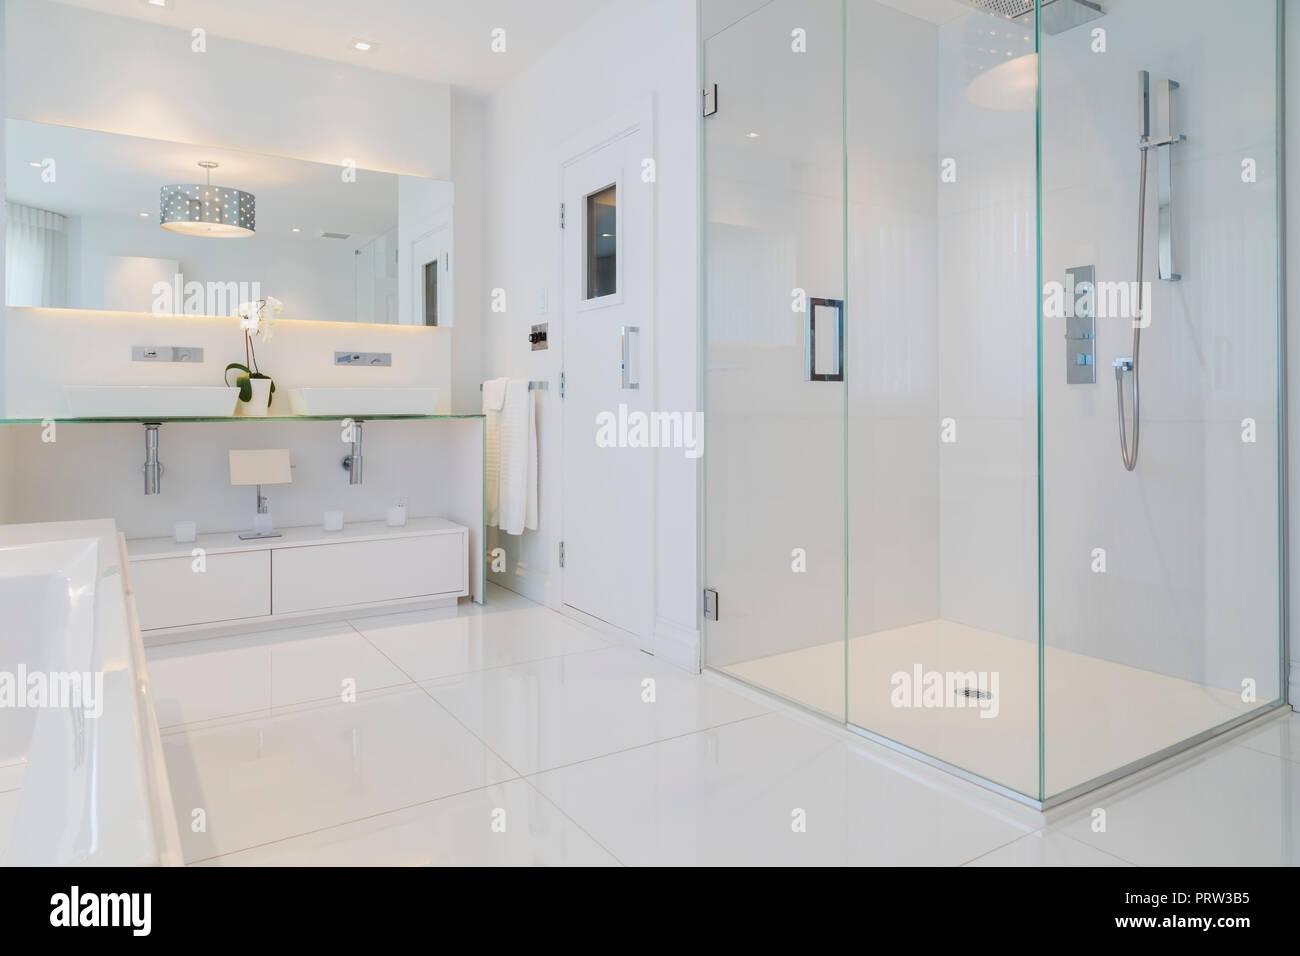 White Bathtub Wall Mirror Glass Shower Stall And Sauna